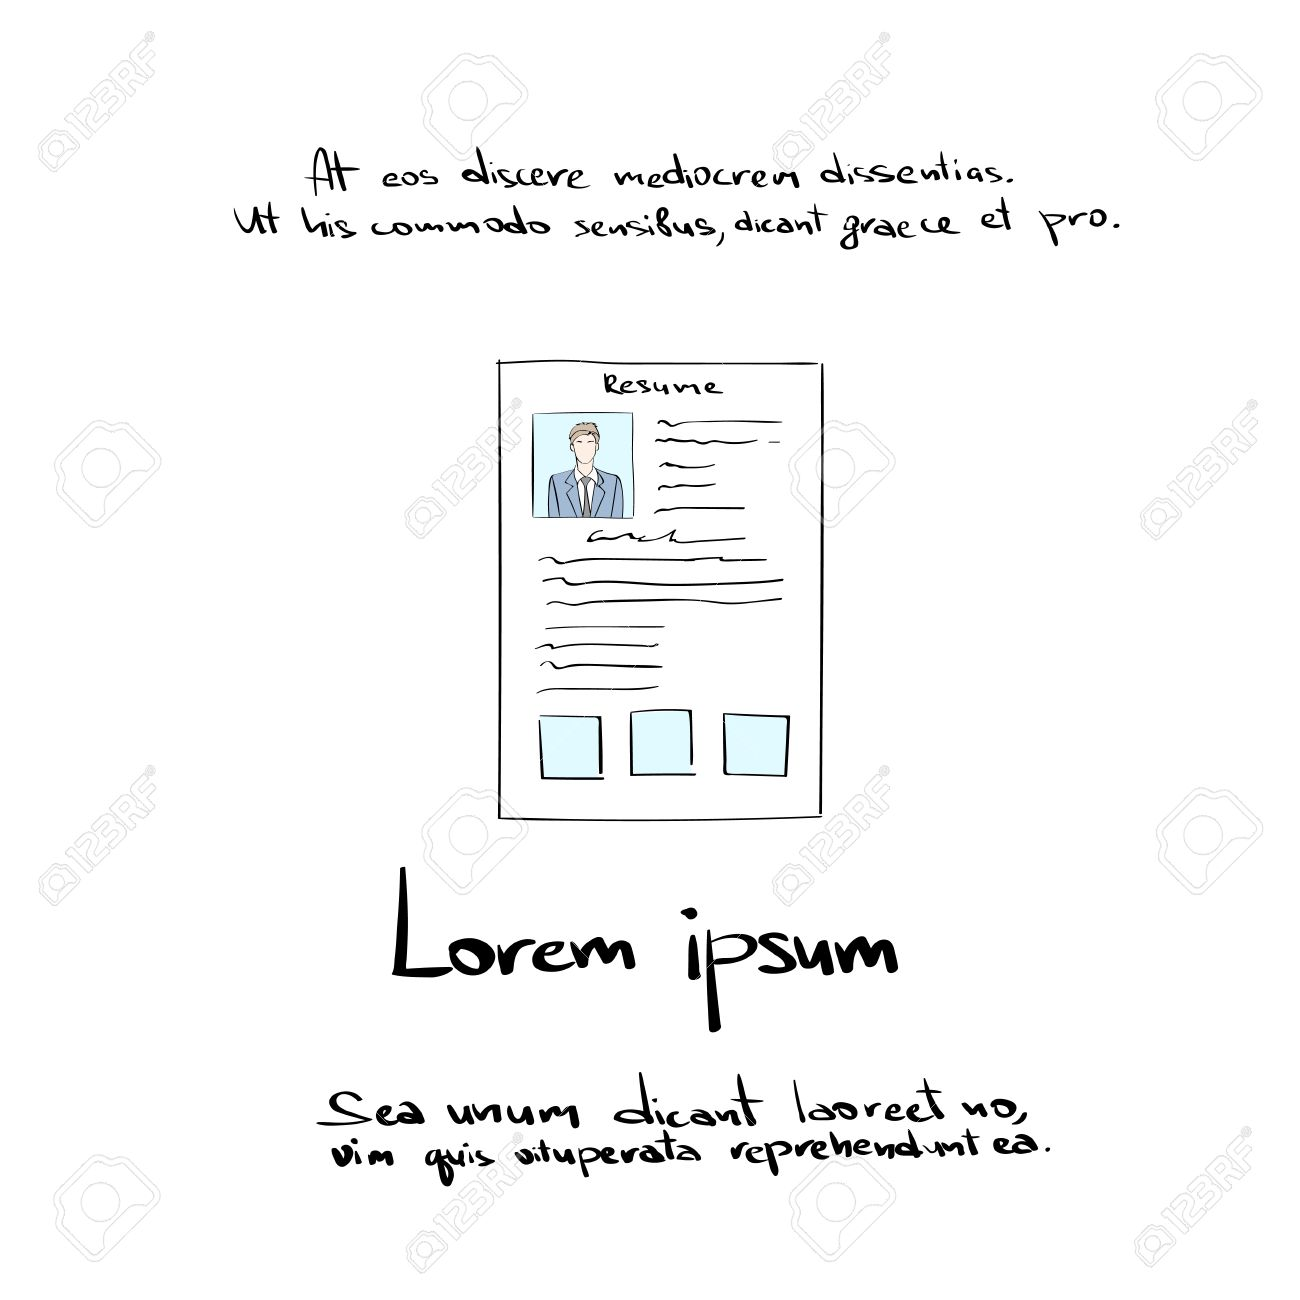 curriculum vitae document hand draw resume cv profile icon vector curriculum vitae document hand draw resume cv profile icon vector illustration stock vector 40696655